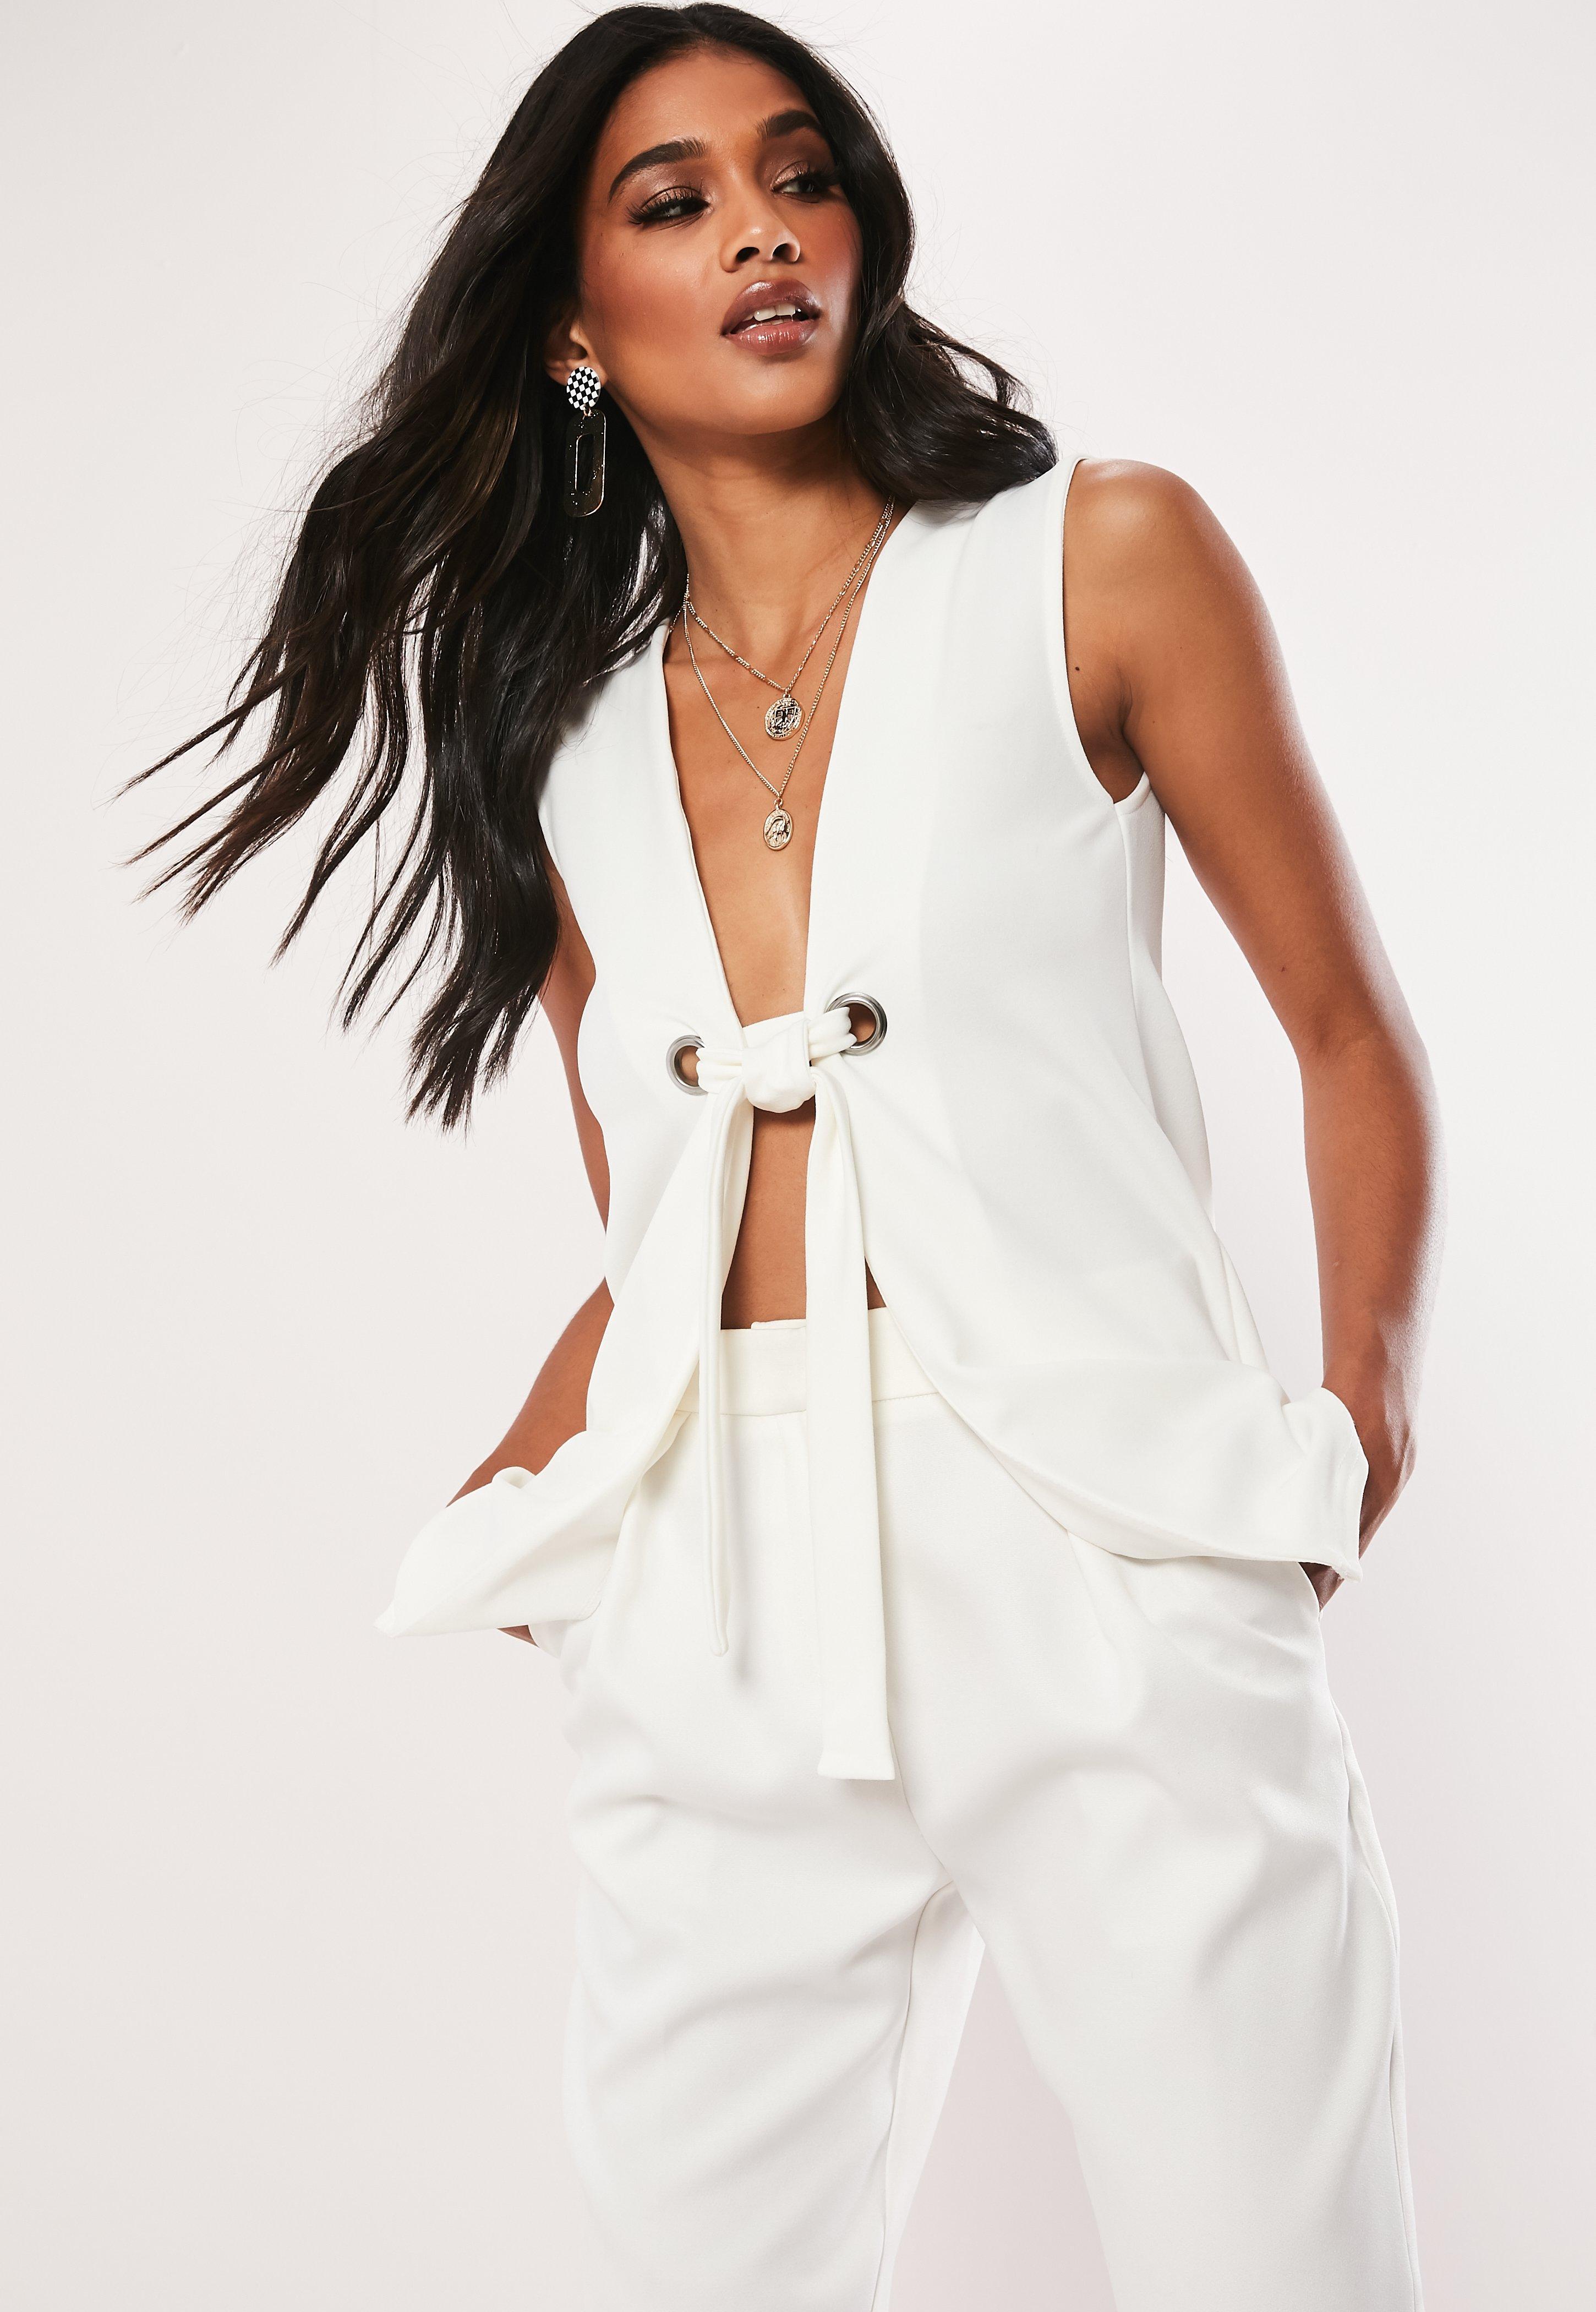 c62b7a5020bc31 Blazers for Women - Shop Smart   Tweed Blazers UK - Missguided